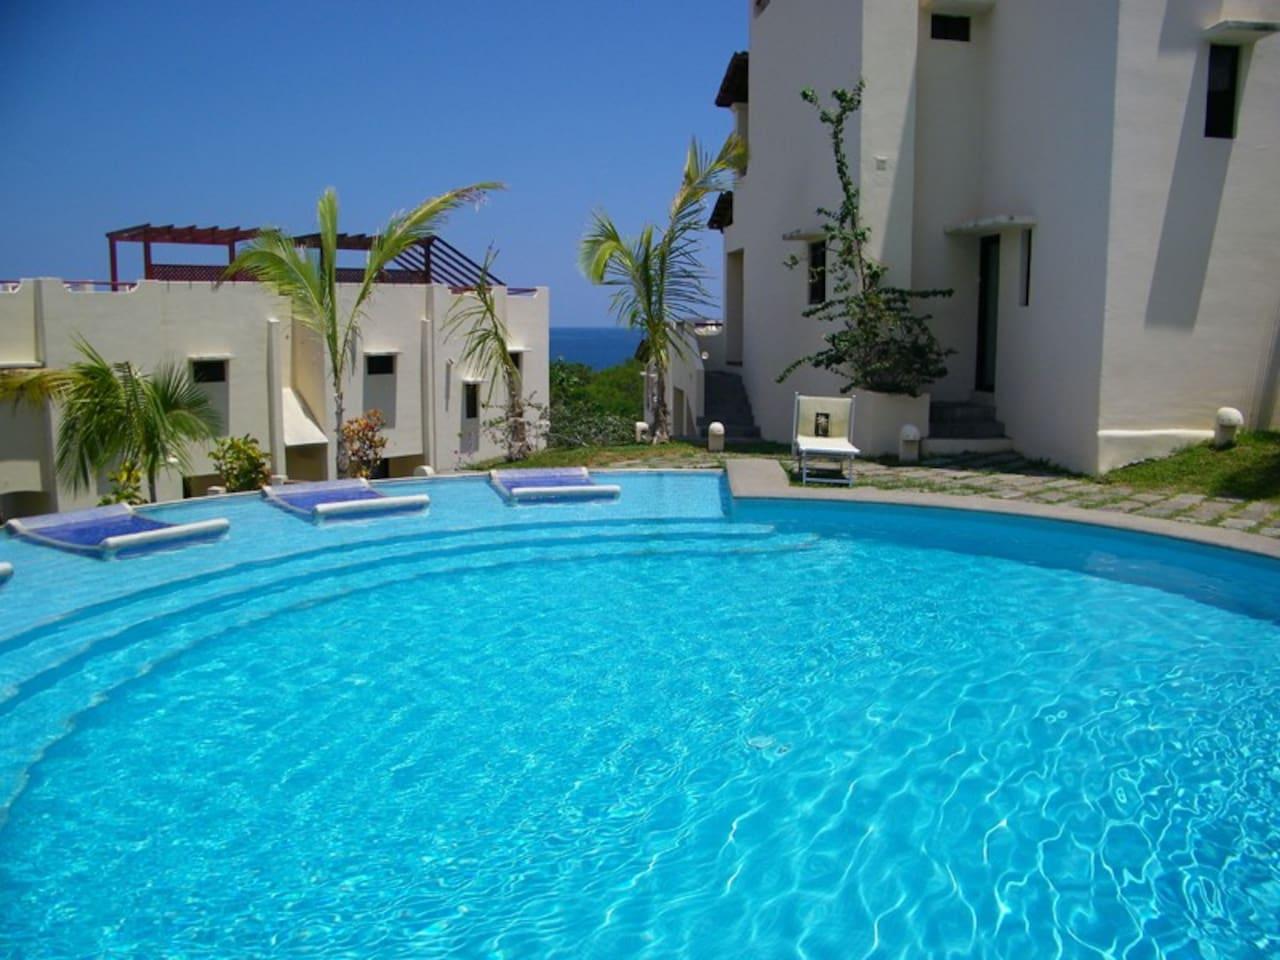 Pool overlooking Coco Beach